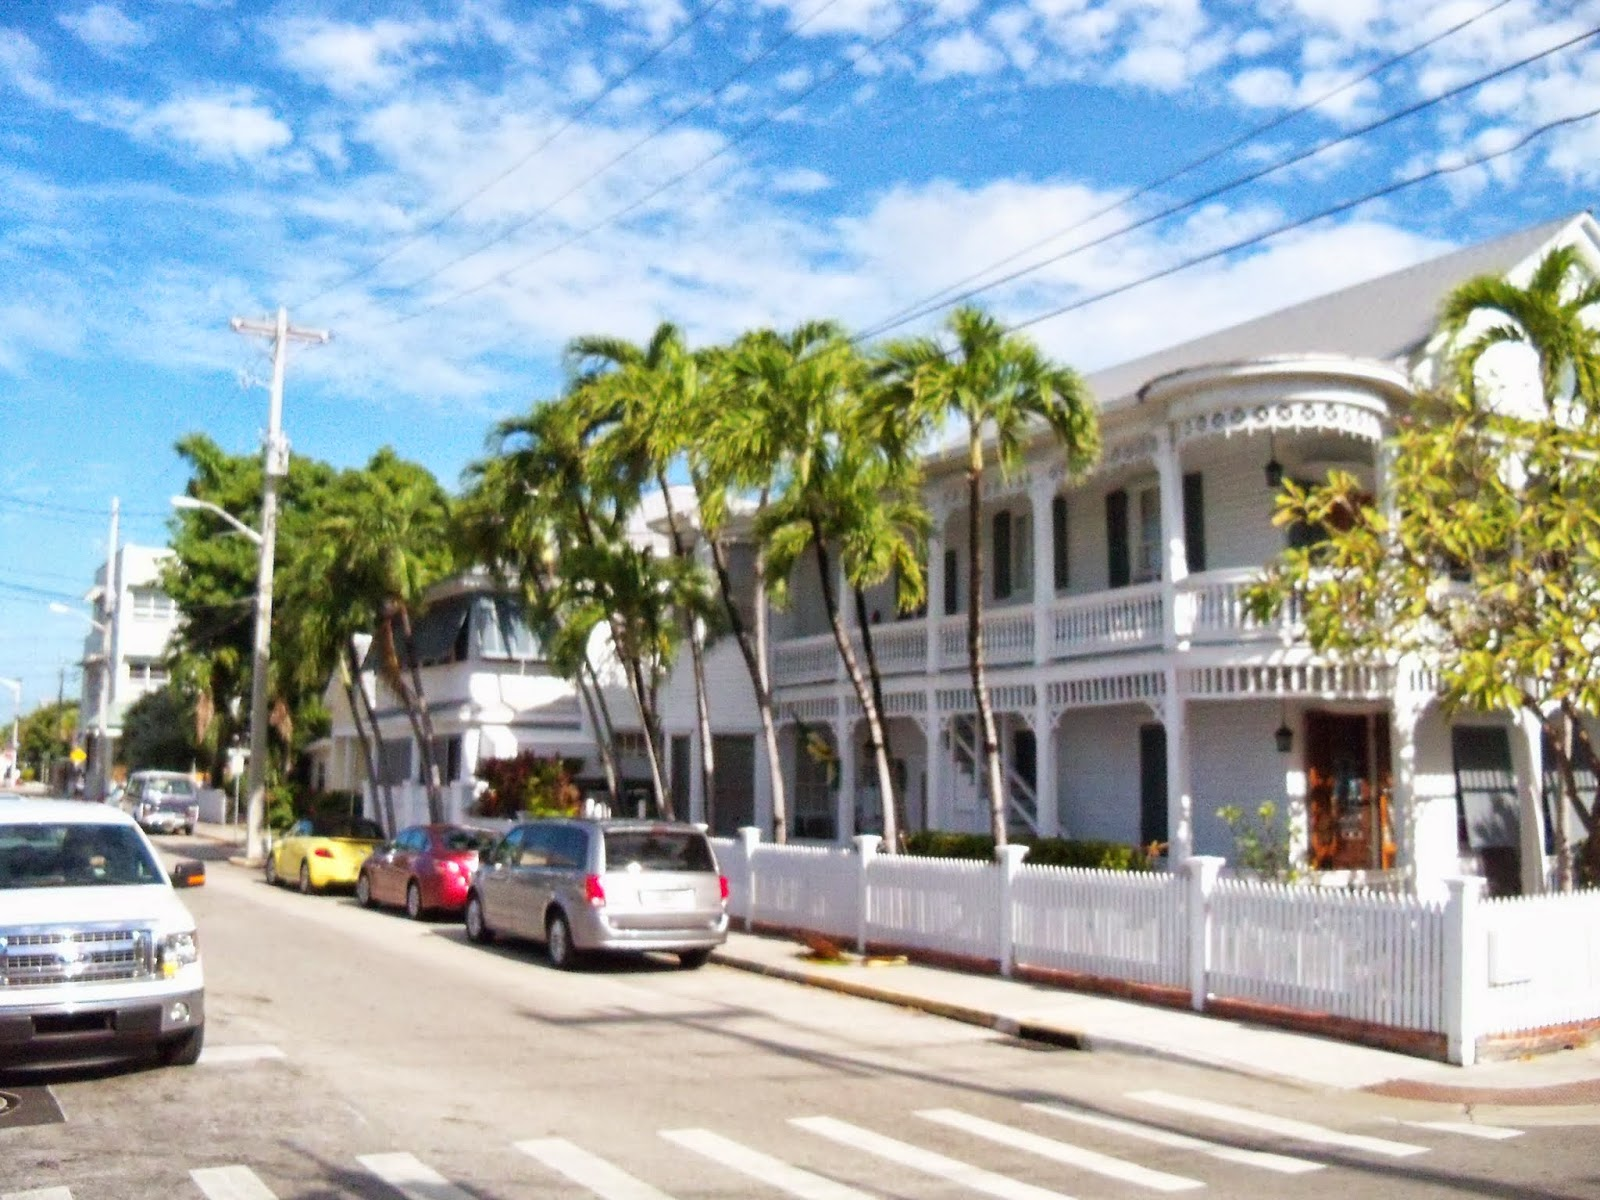 Key West Vacation - 116_5663.JPG